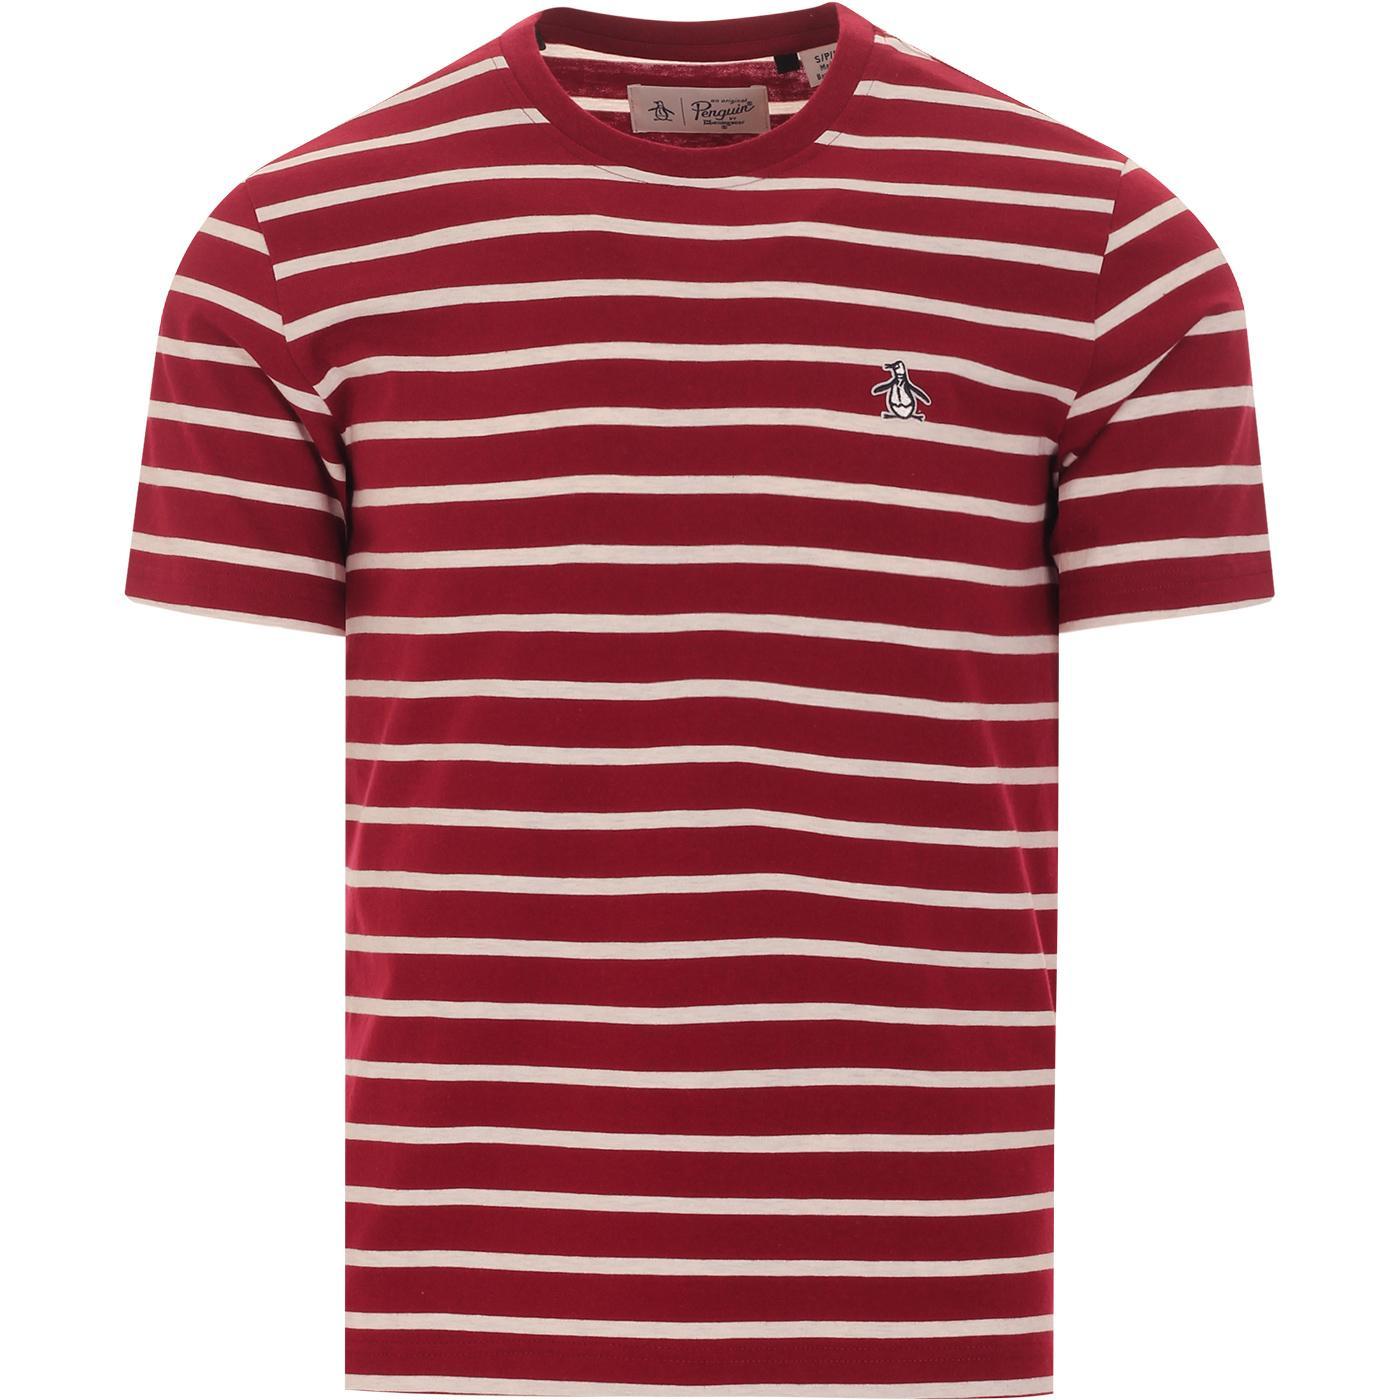 ORIGINAL PENGUIN Retro Mod Breton Stripe Tee (Red)